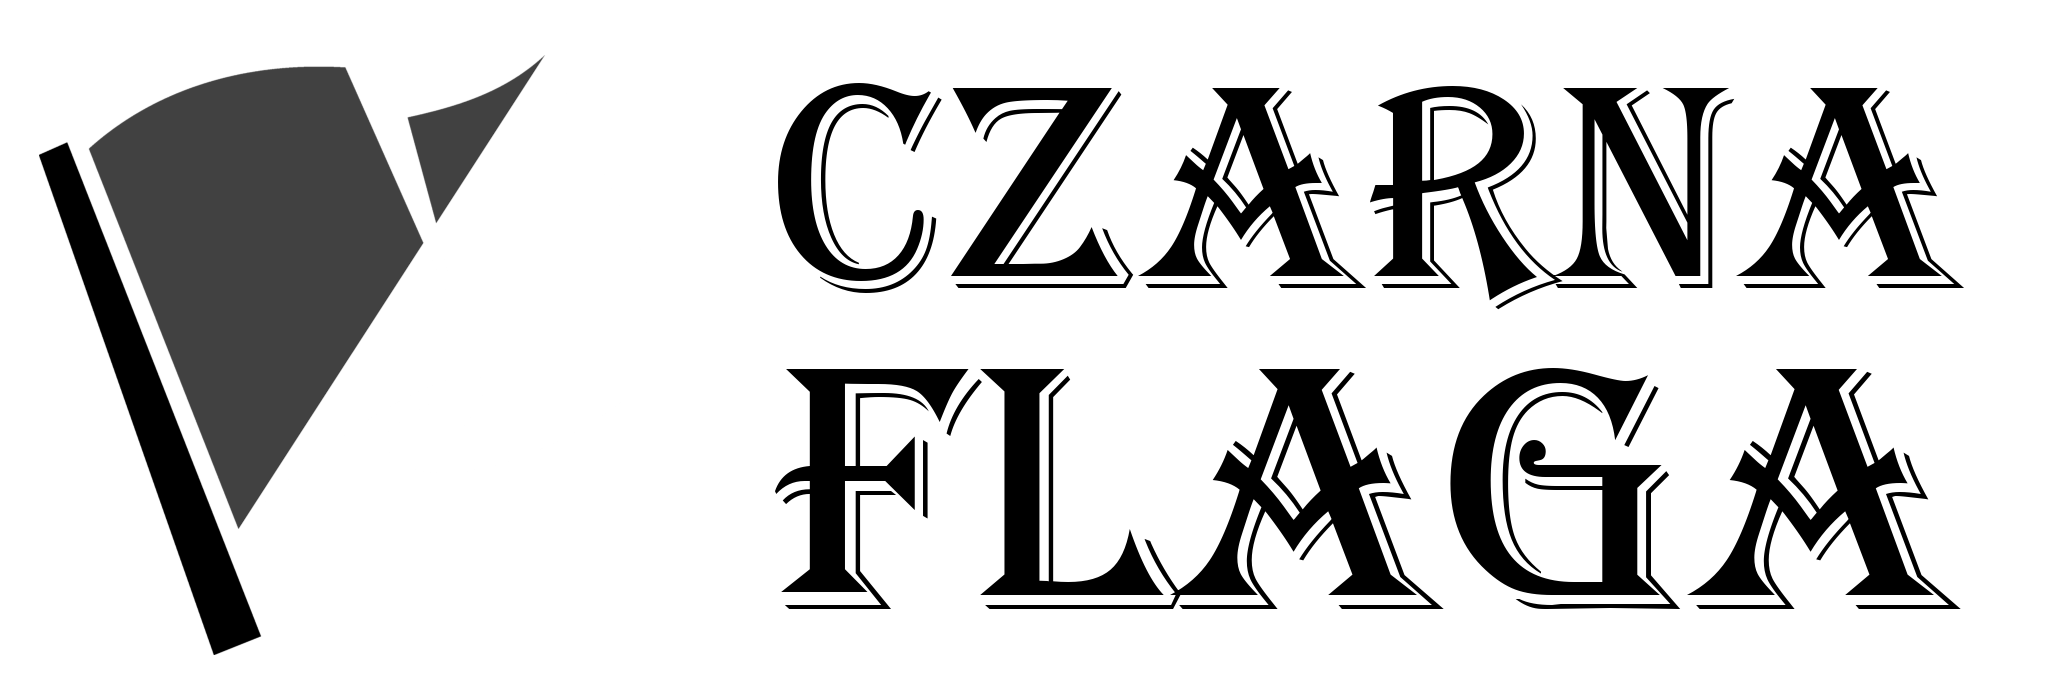 czarna flaga logo